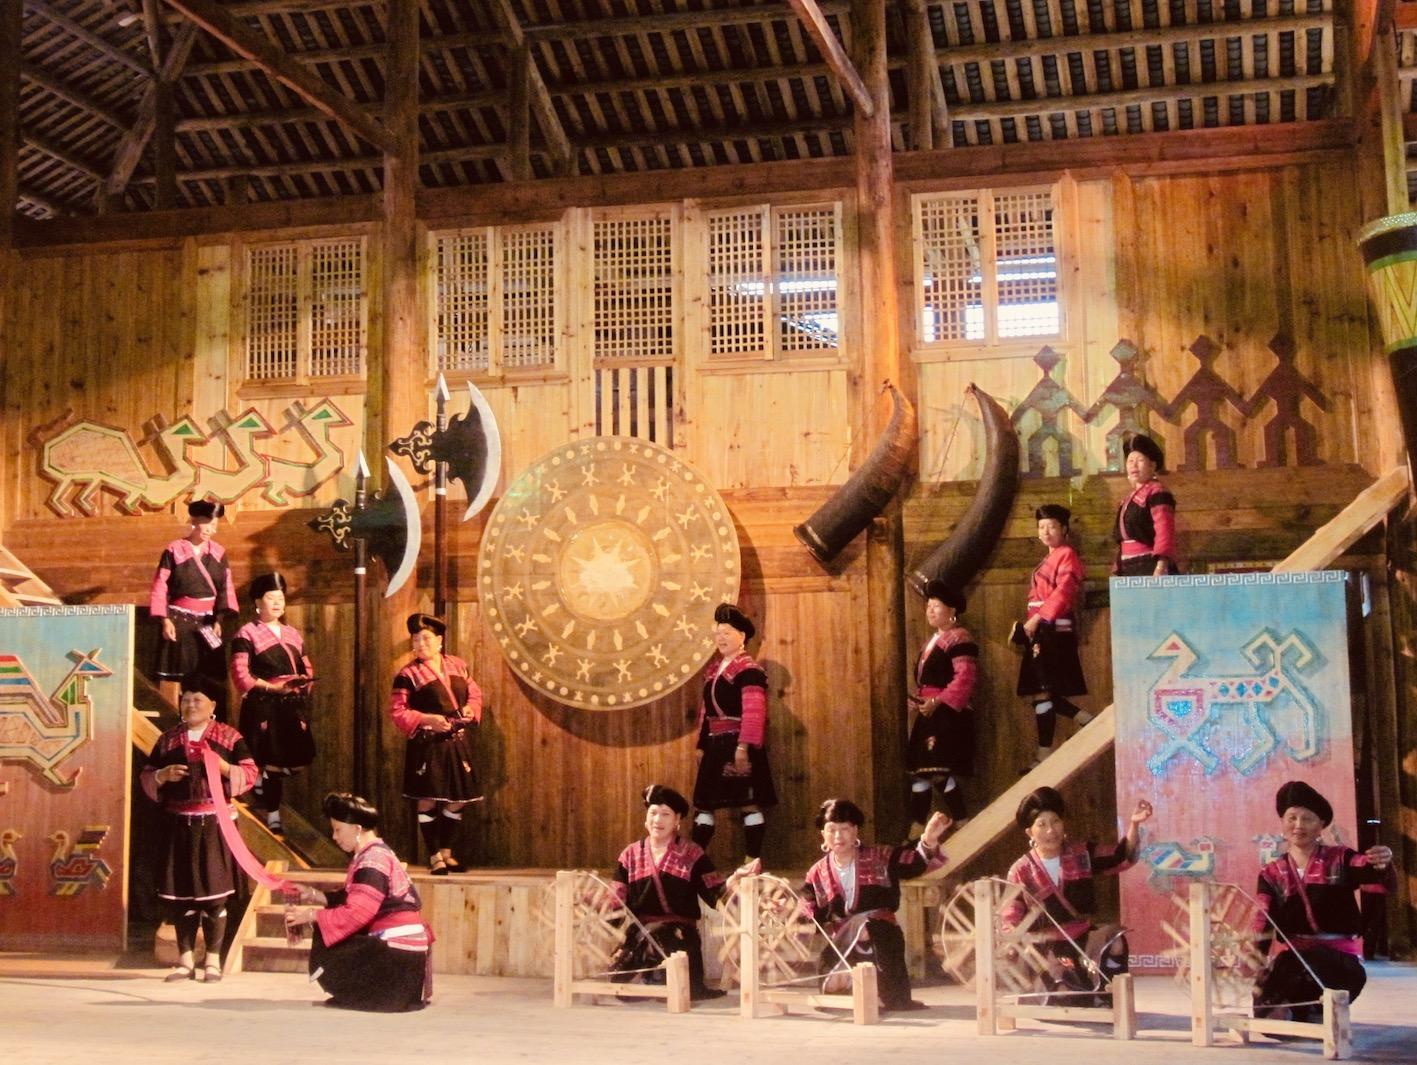 Huangluo Yao long hair Village China.